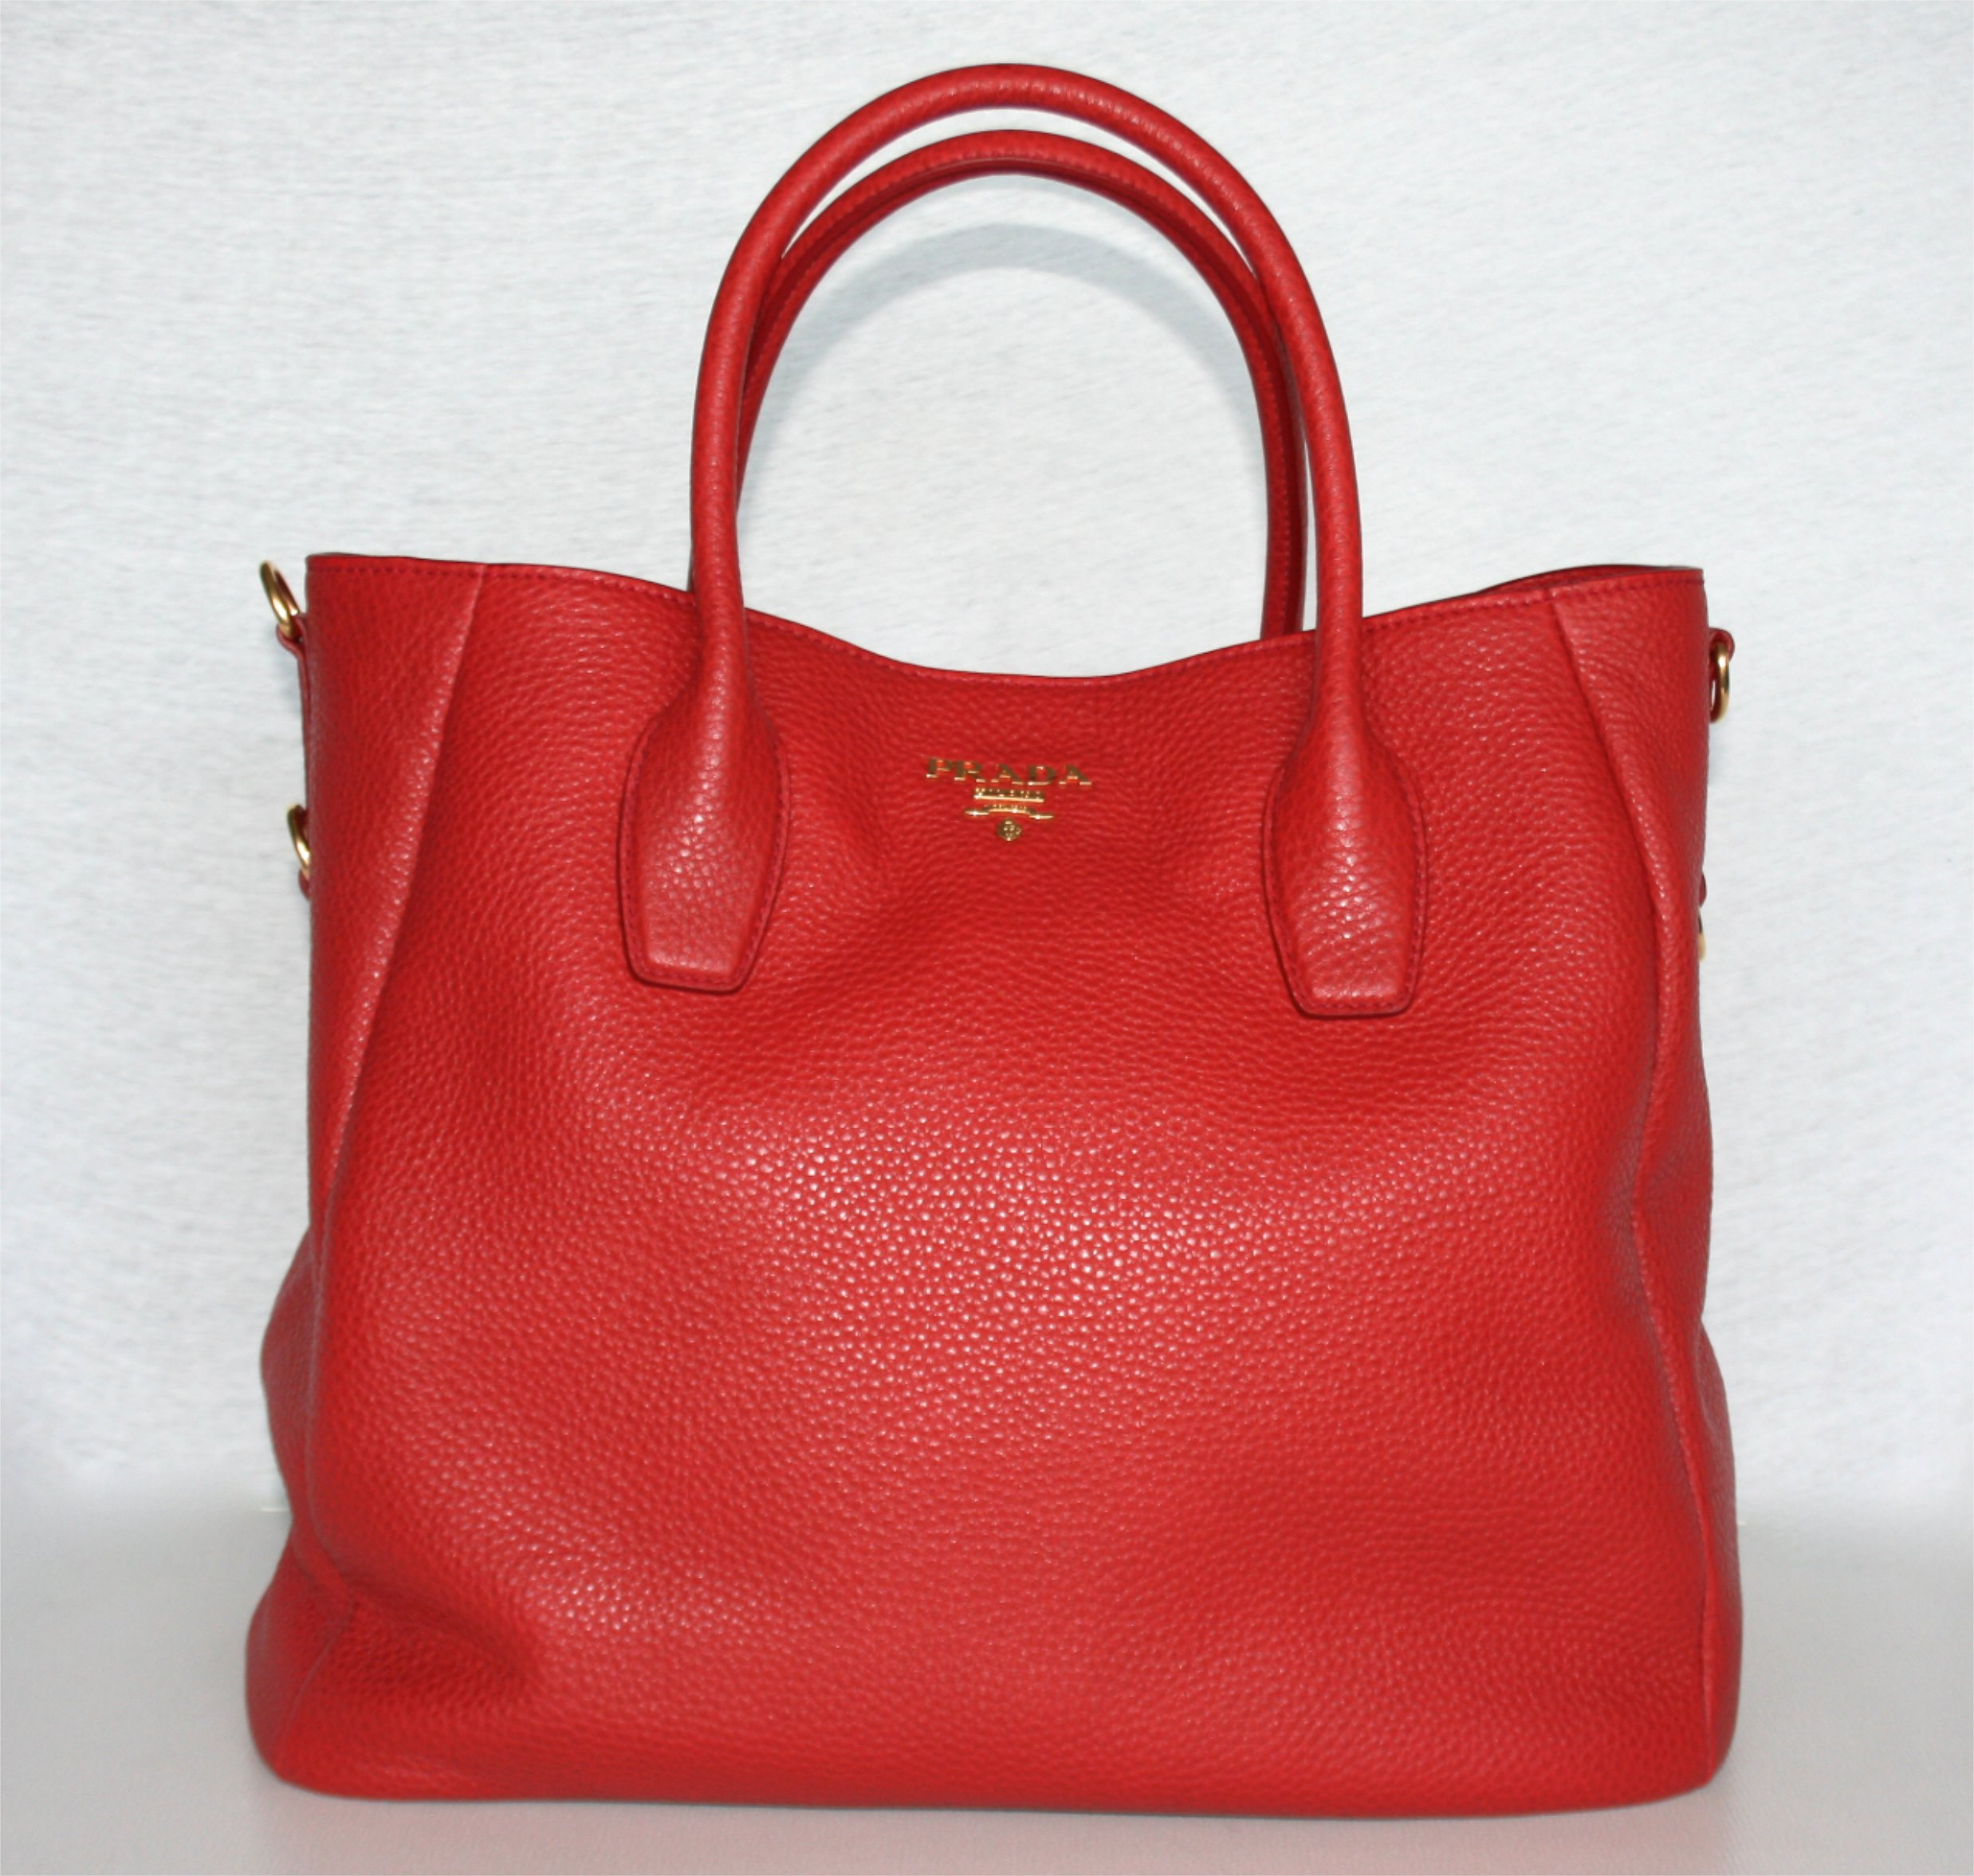 prada luxus handtasche tasche purse handbag bag neu new. Black Bedroom Furniture Sets. Home Design Ideas